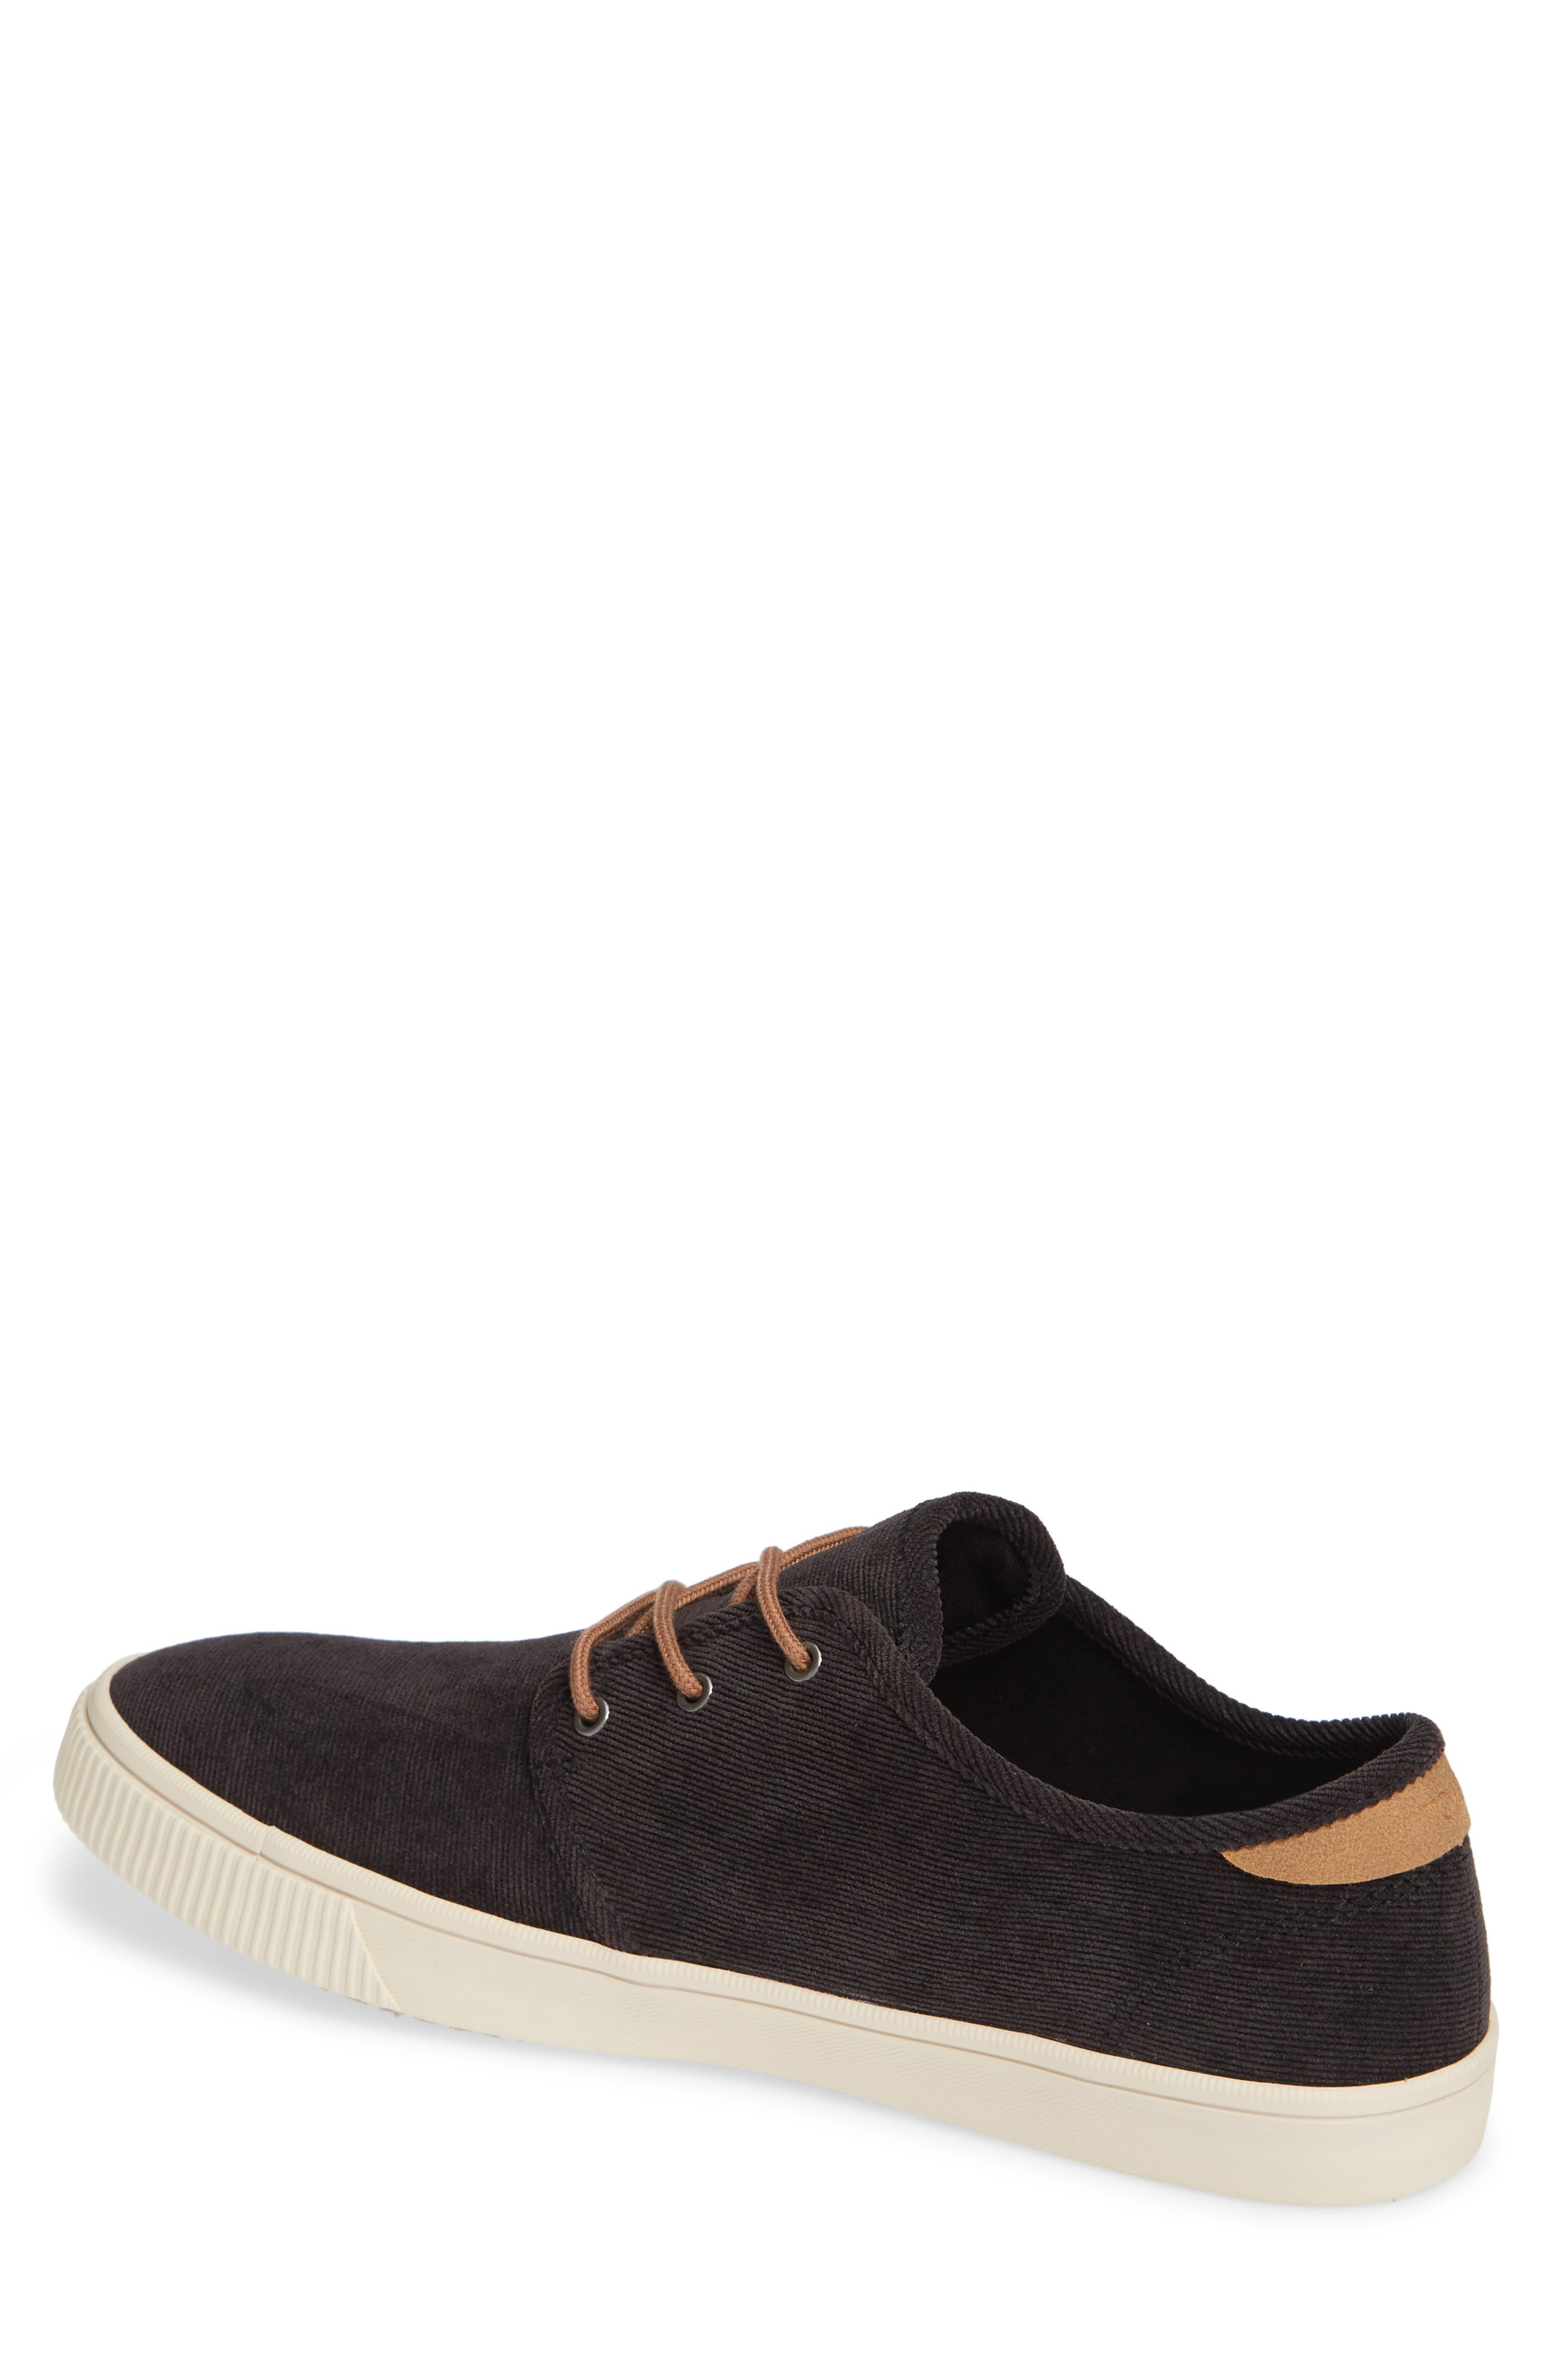 Carlo Sneaker,                             Alternate thumbnail 2, color,                             BLACK